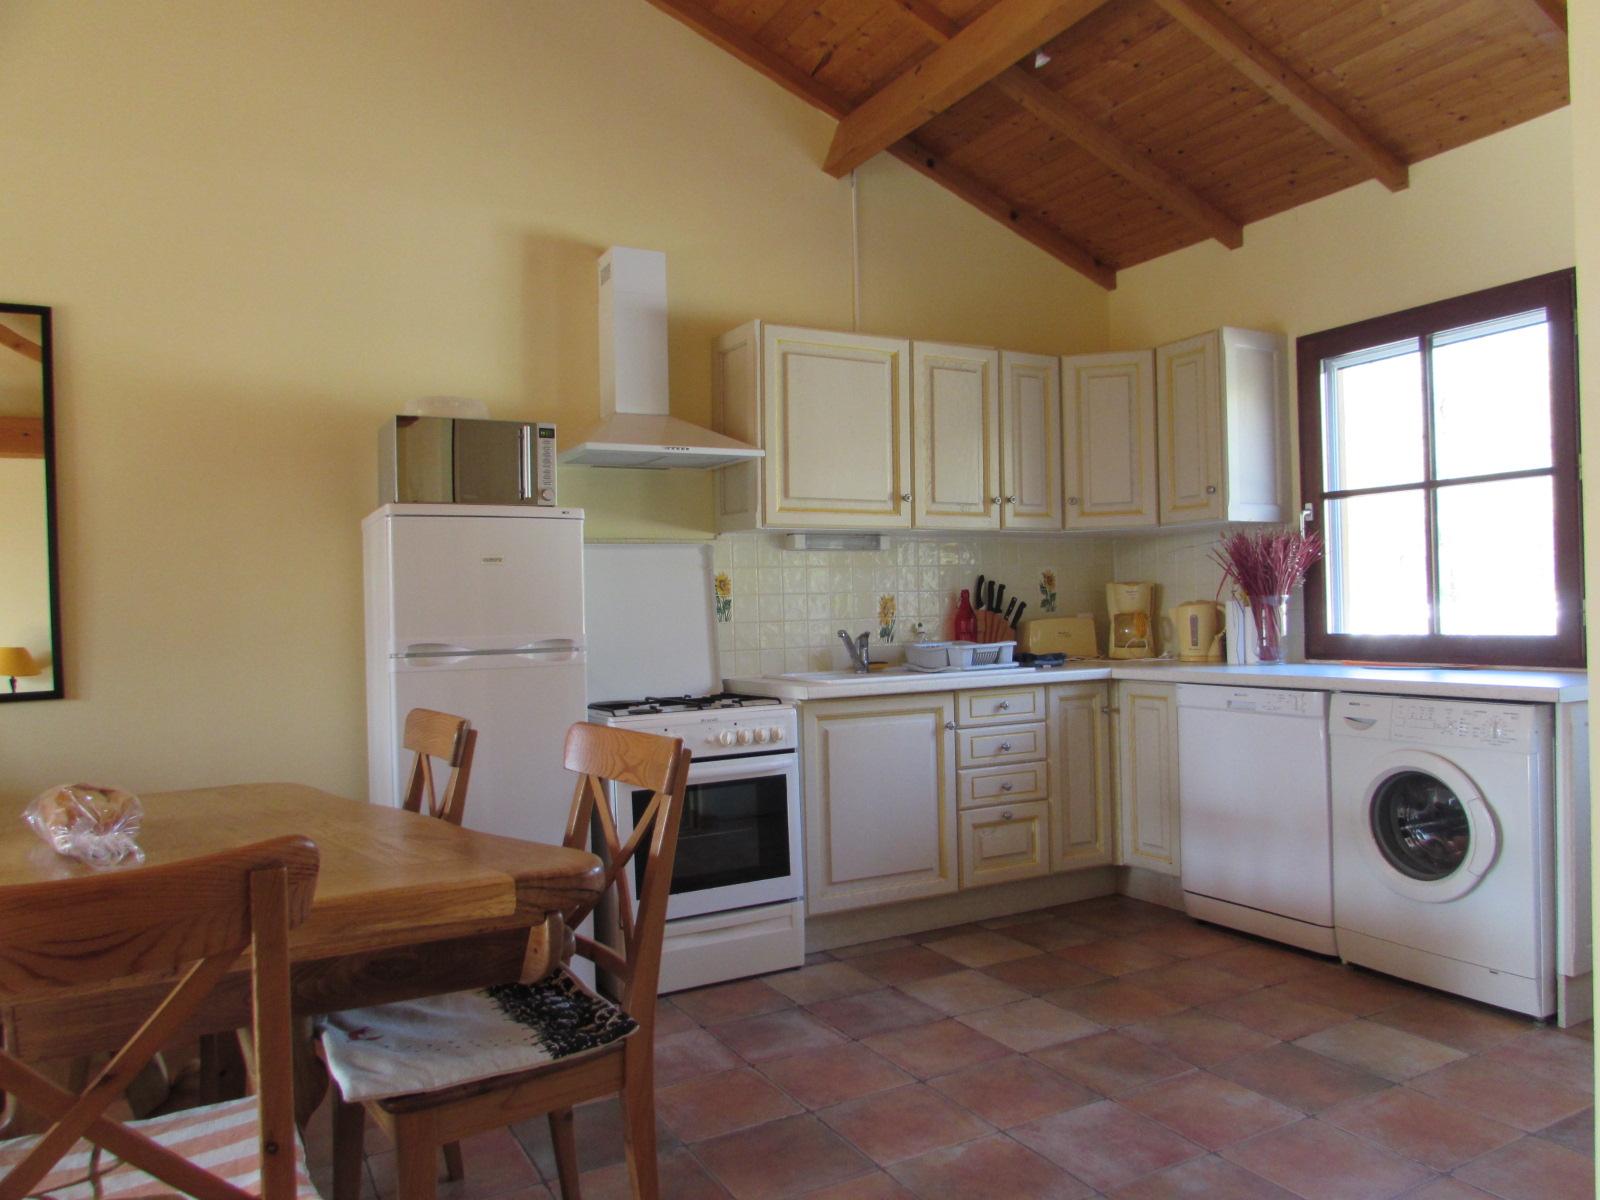 meuble-tournesol-cuisine-nalliers-85-hlo-3